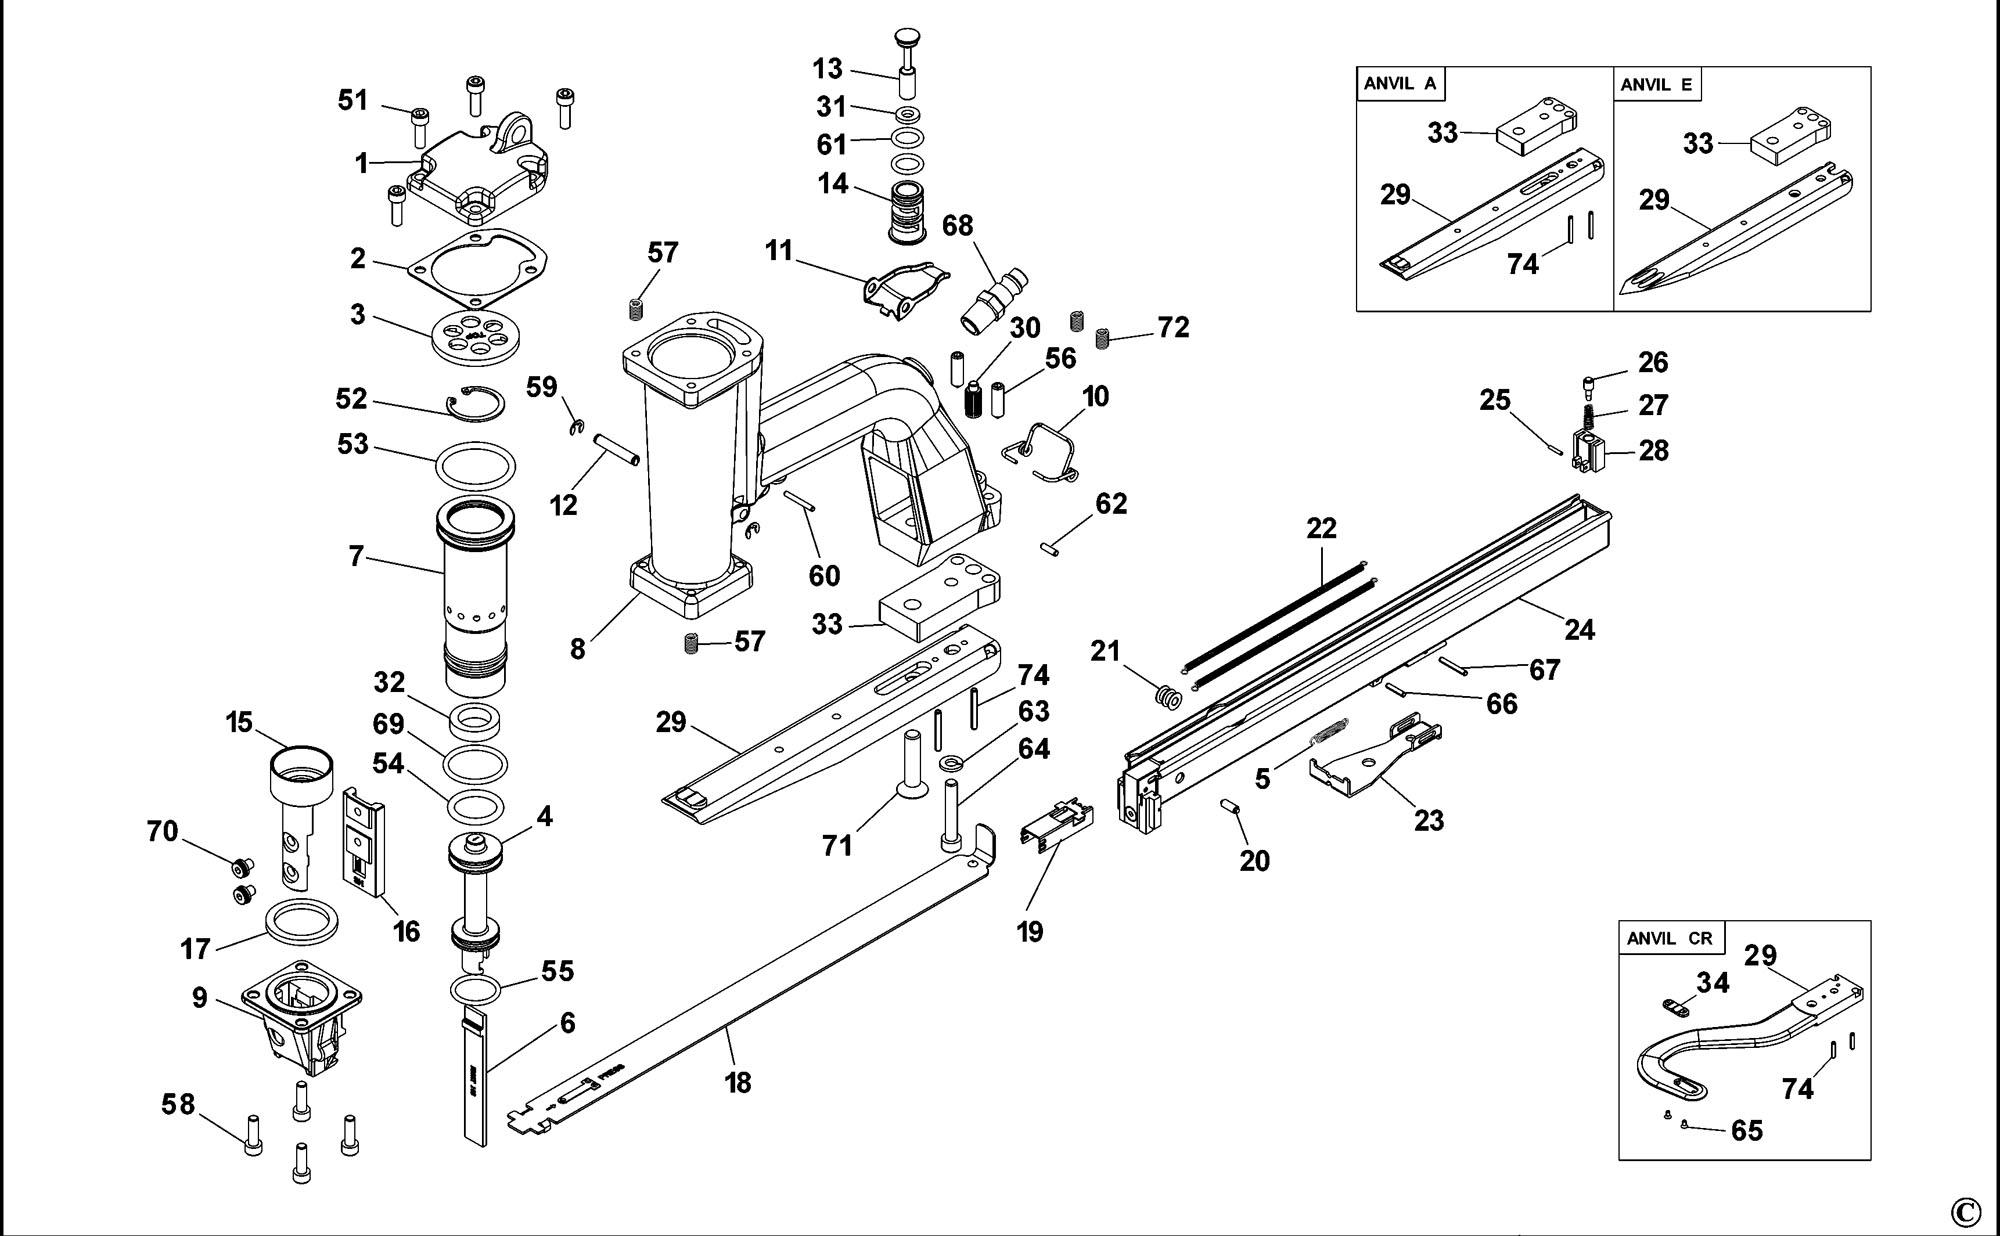 spares for bostitch p51 pneumatic plier  type reva  spare p51  type reva from power tool centre